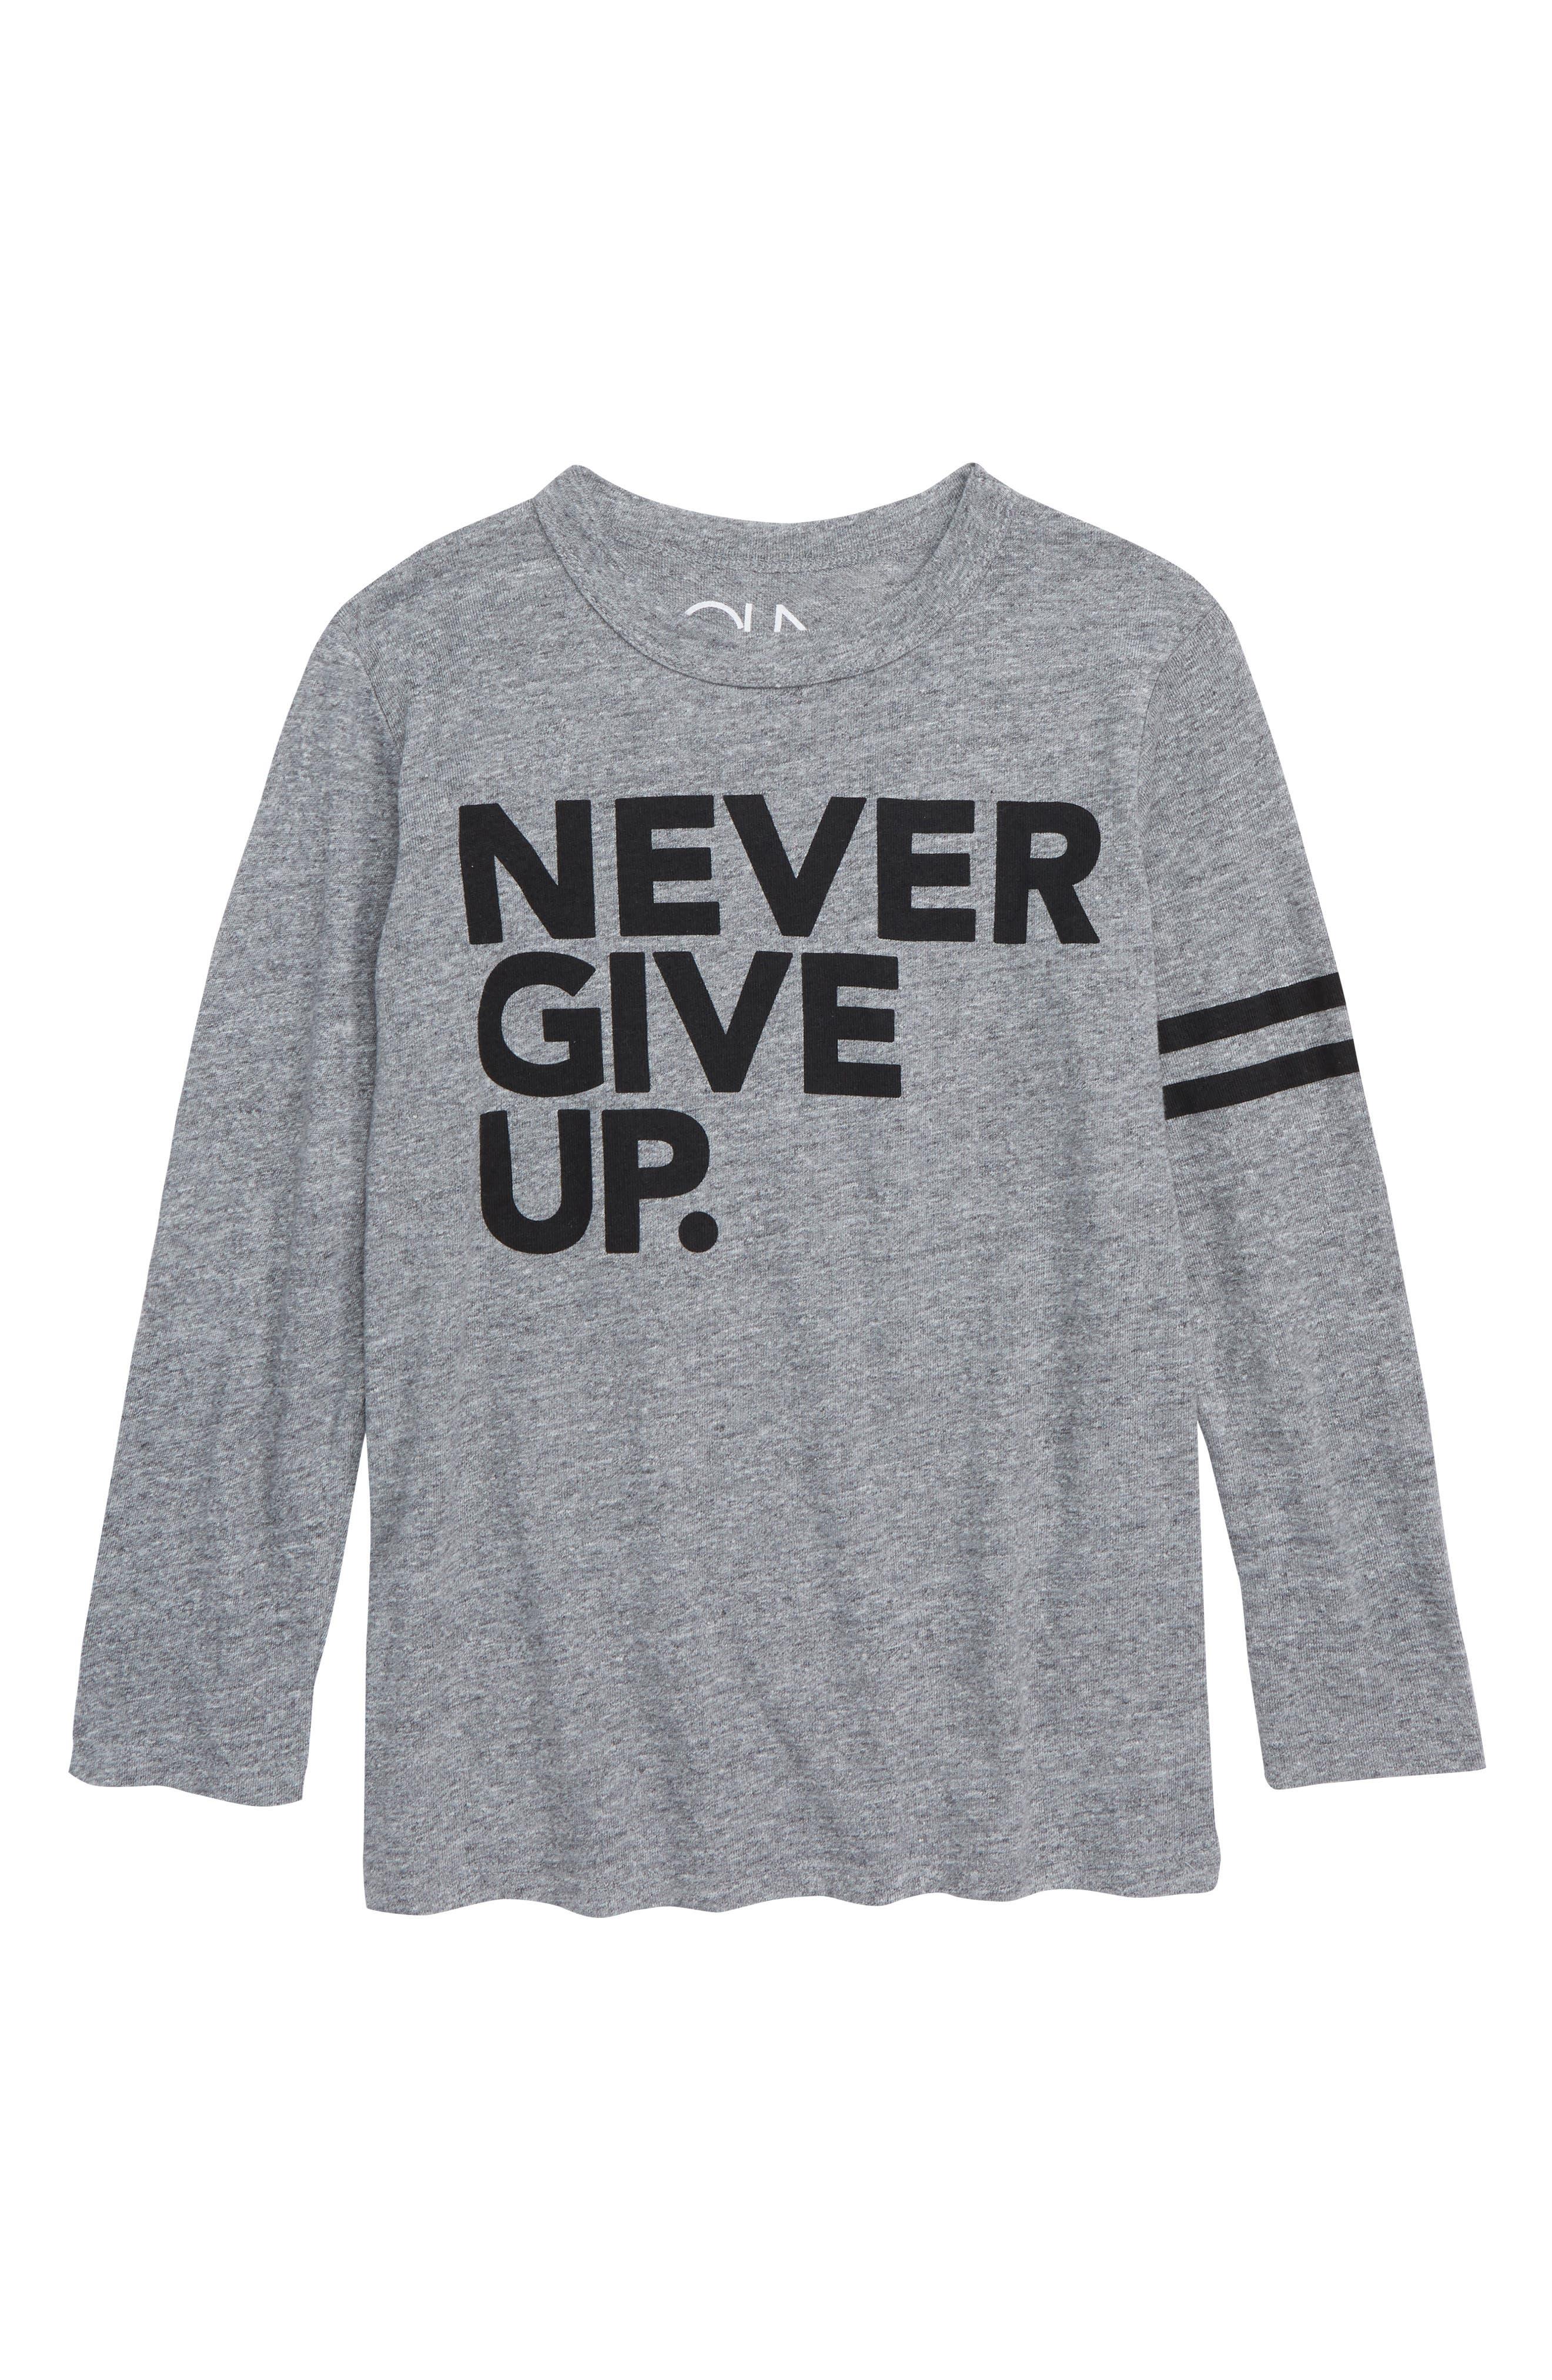 CHASER,                             Never Give Up T-Shirt,                             Main thumbnail 1, color,                             STREAKY GREY